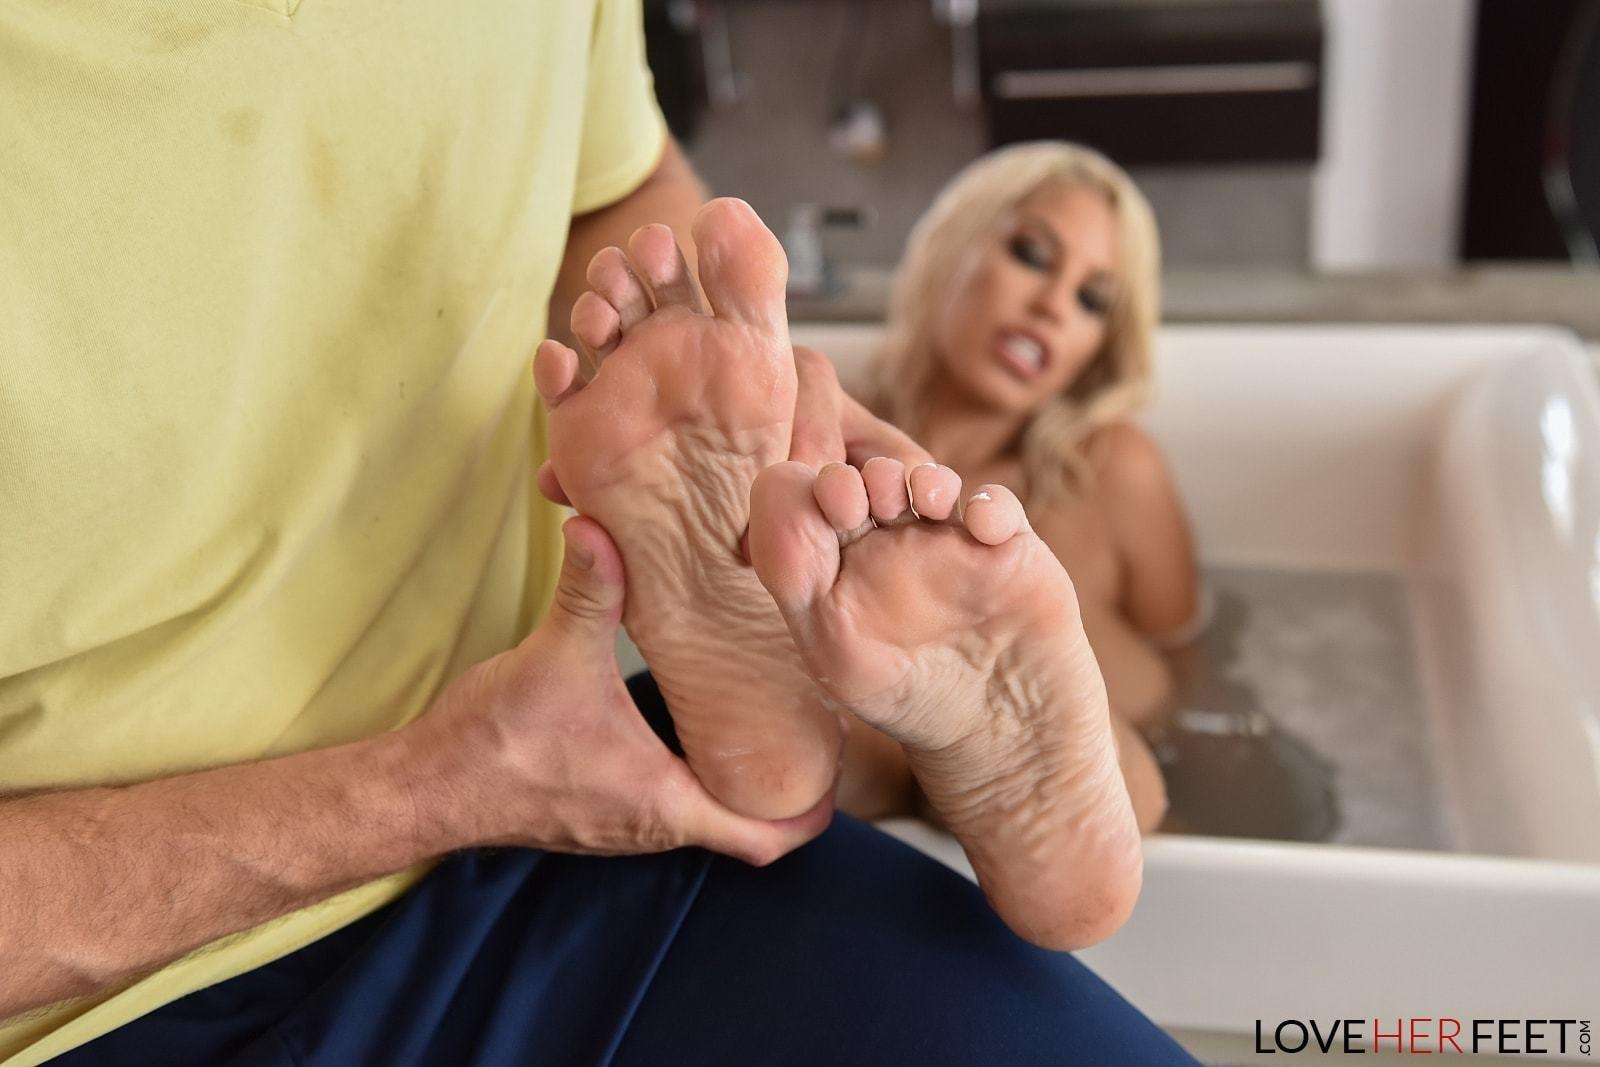 Feet bridgette b Bridgette B's